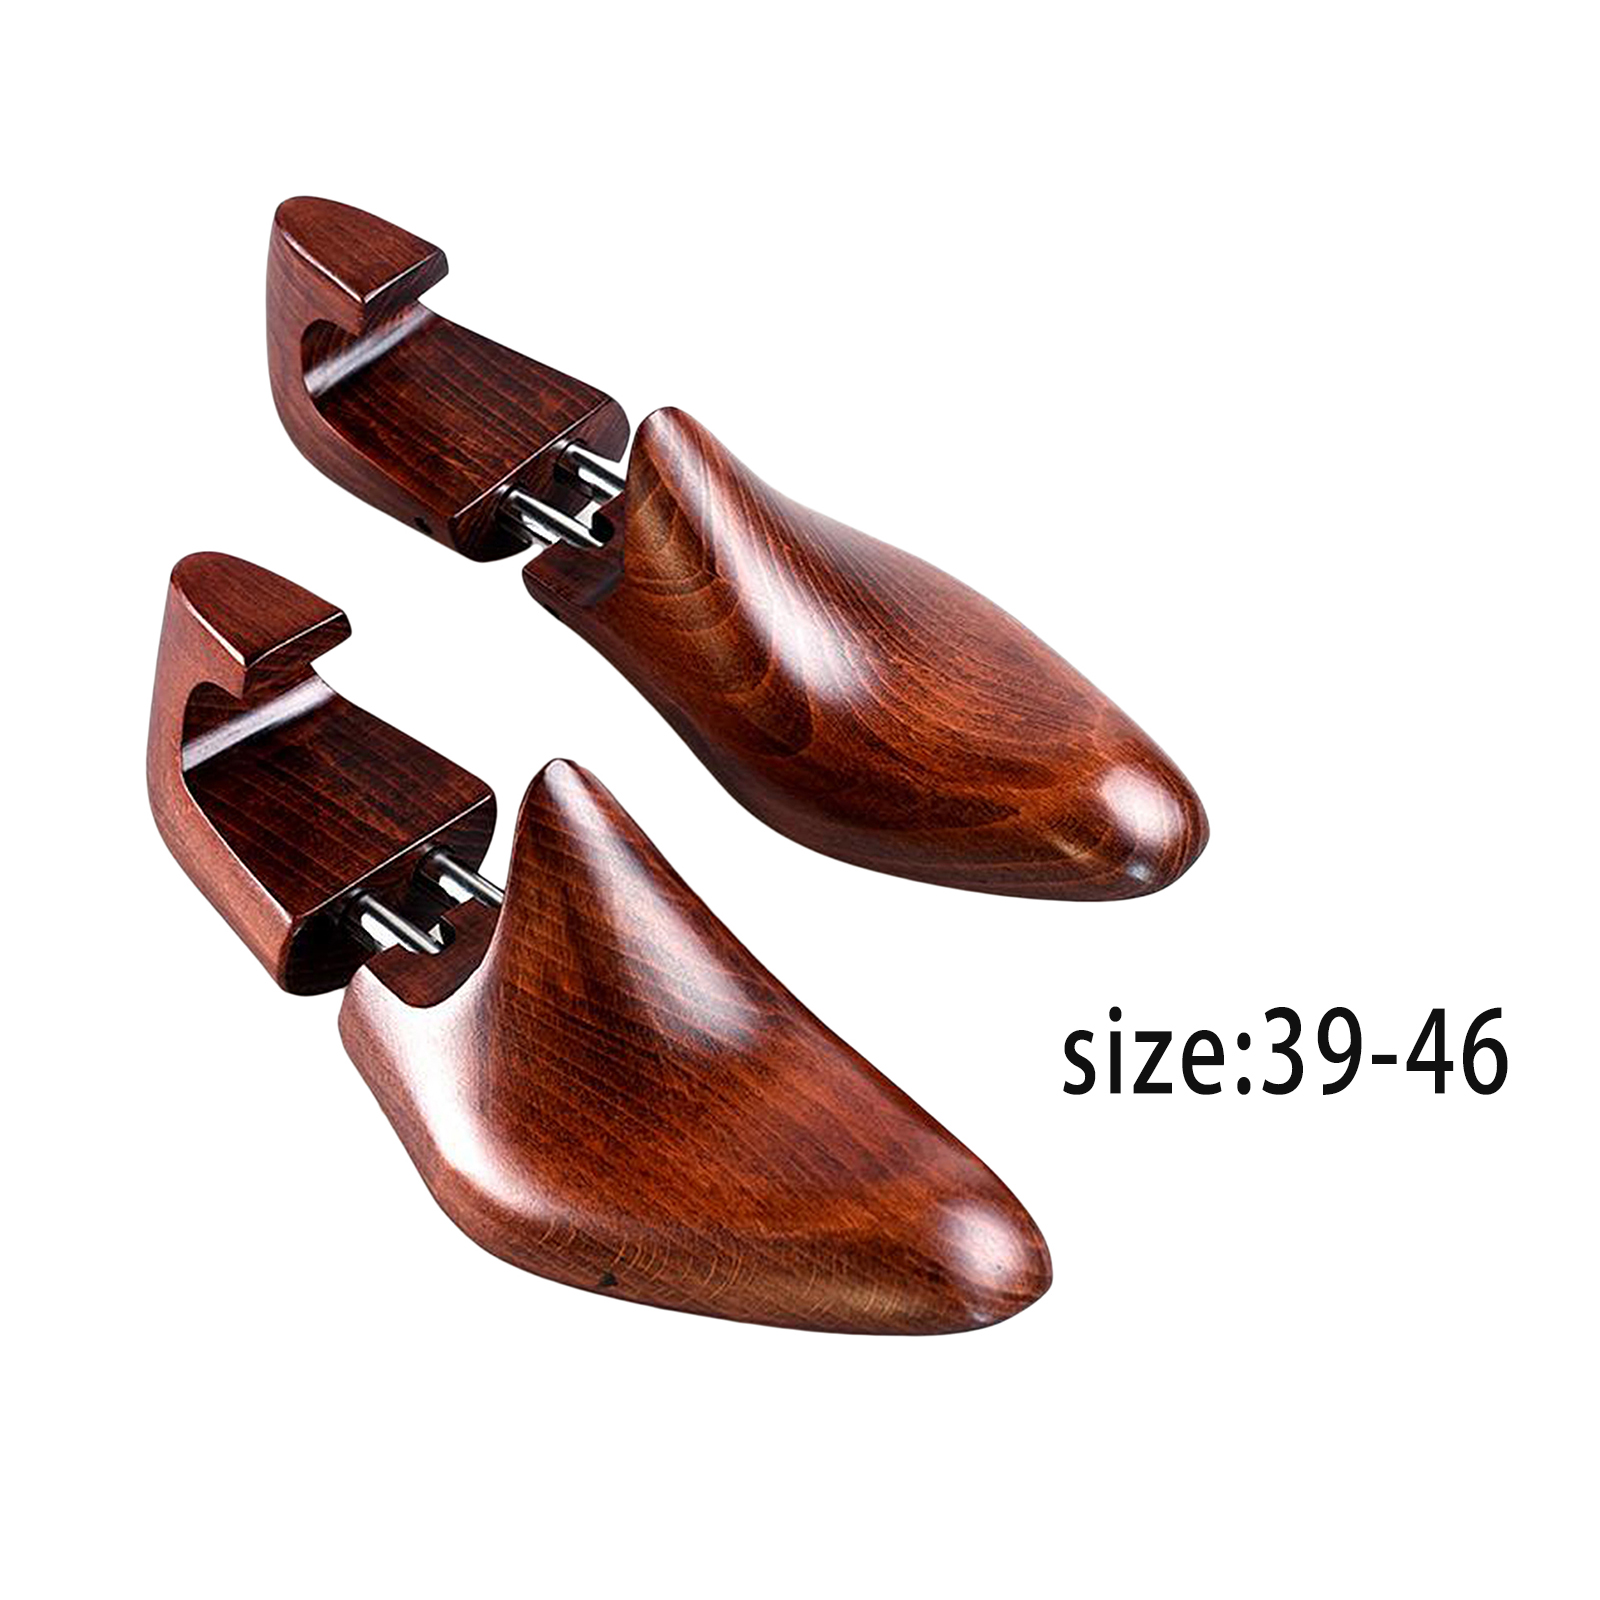 Pine Wood Men's Women's Shoe Stretcher Shoe Trees Shaper Stretcher Pair of 1